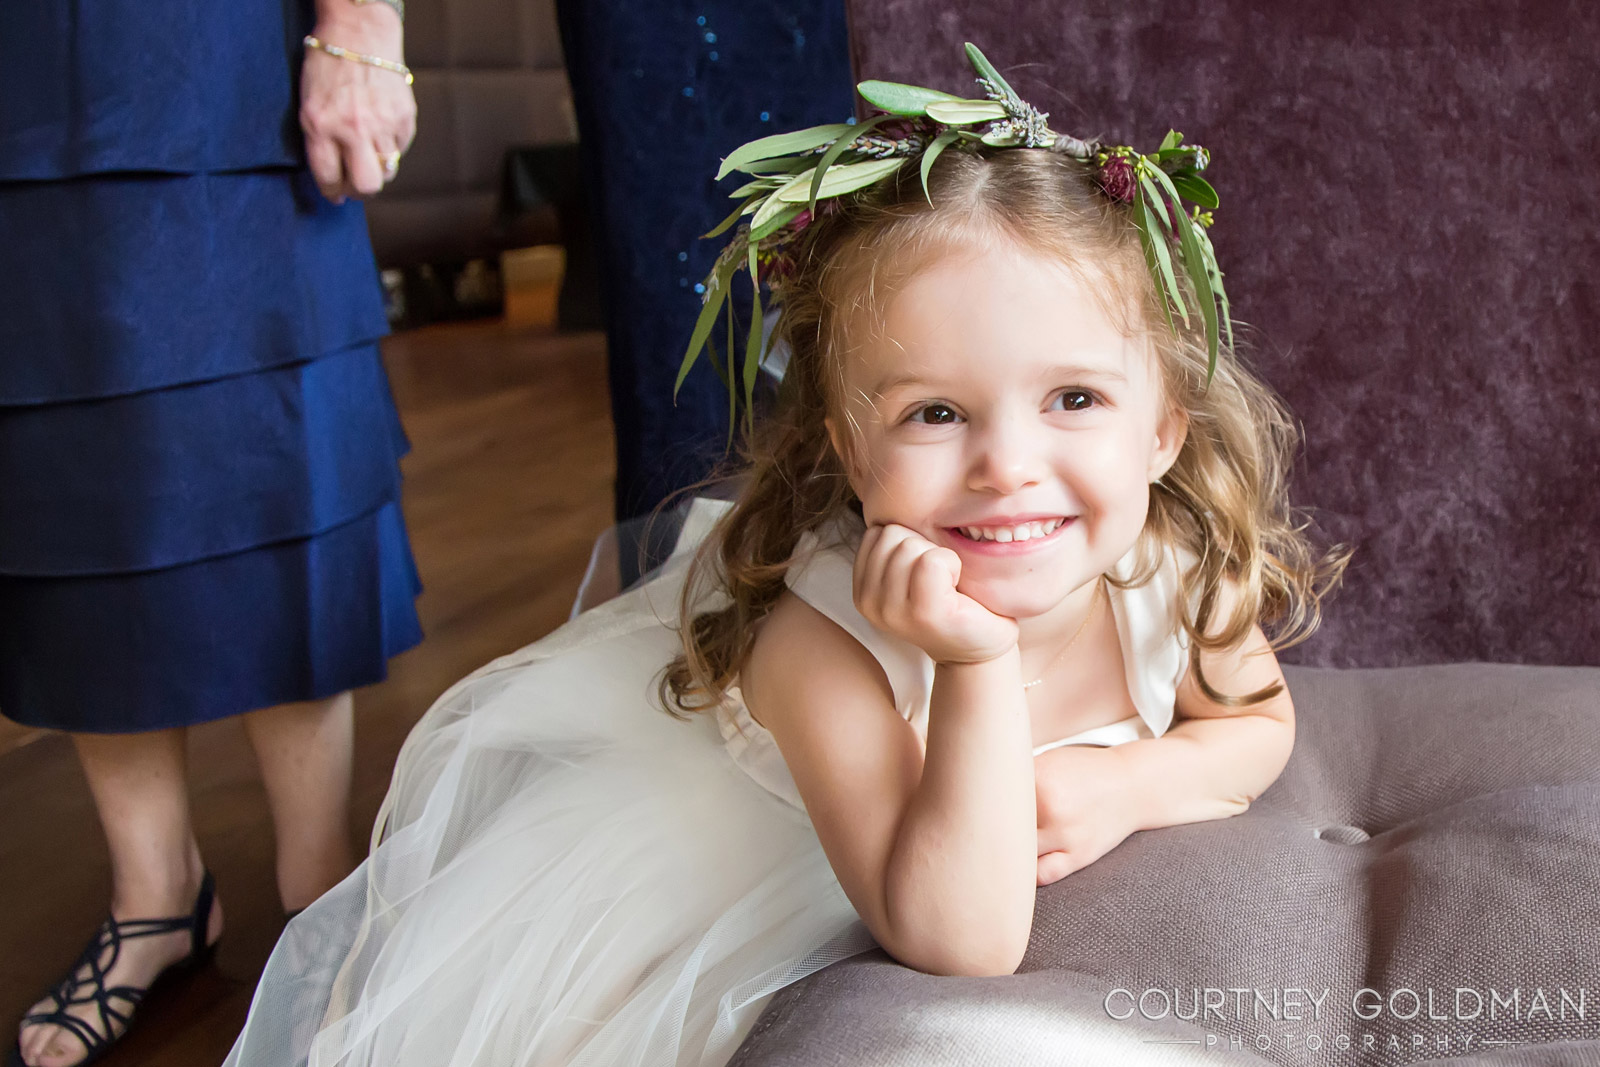 Atlanta-Wedding-Photography-by-Courtney-Goldman-14.jpg